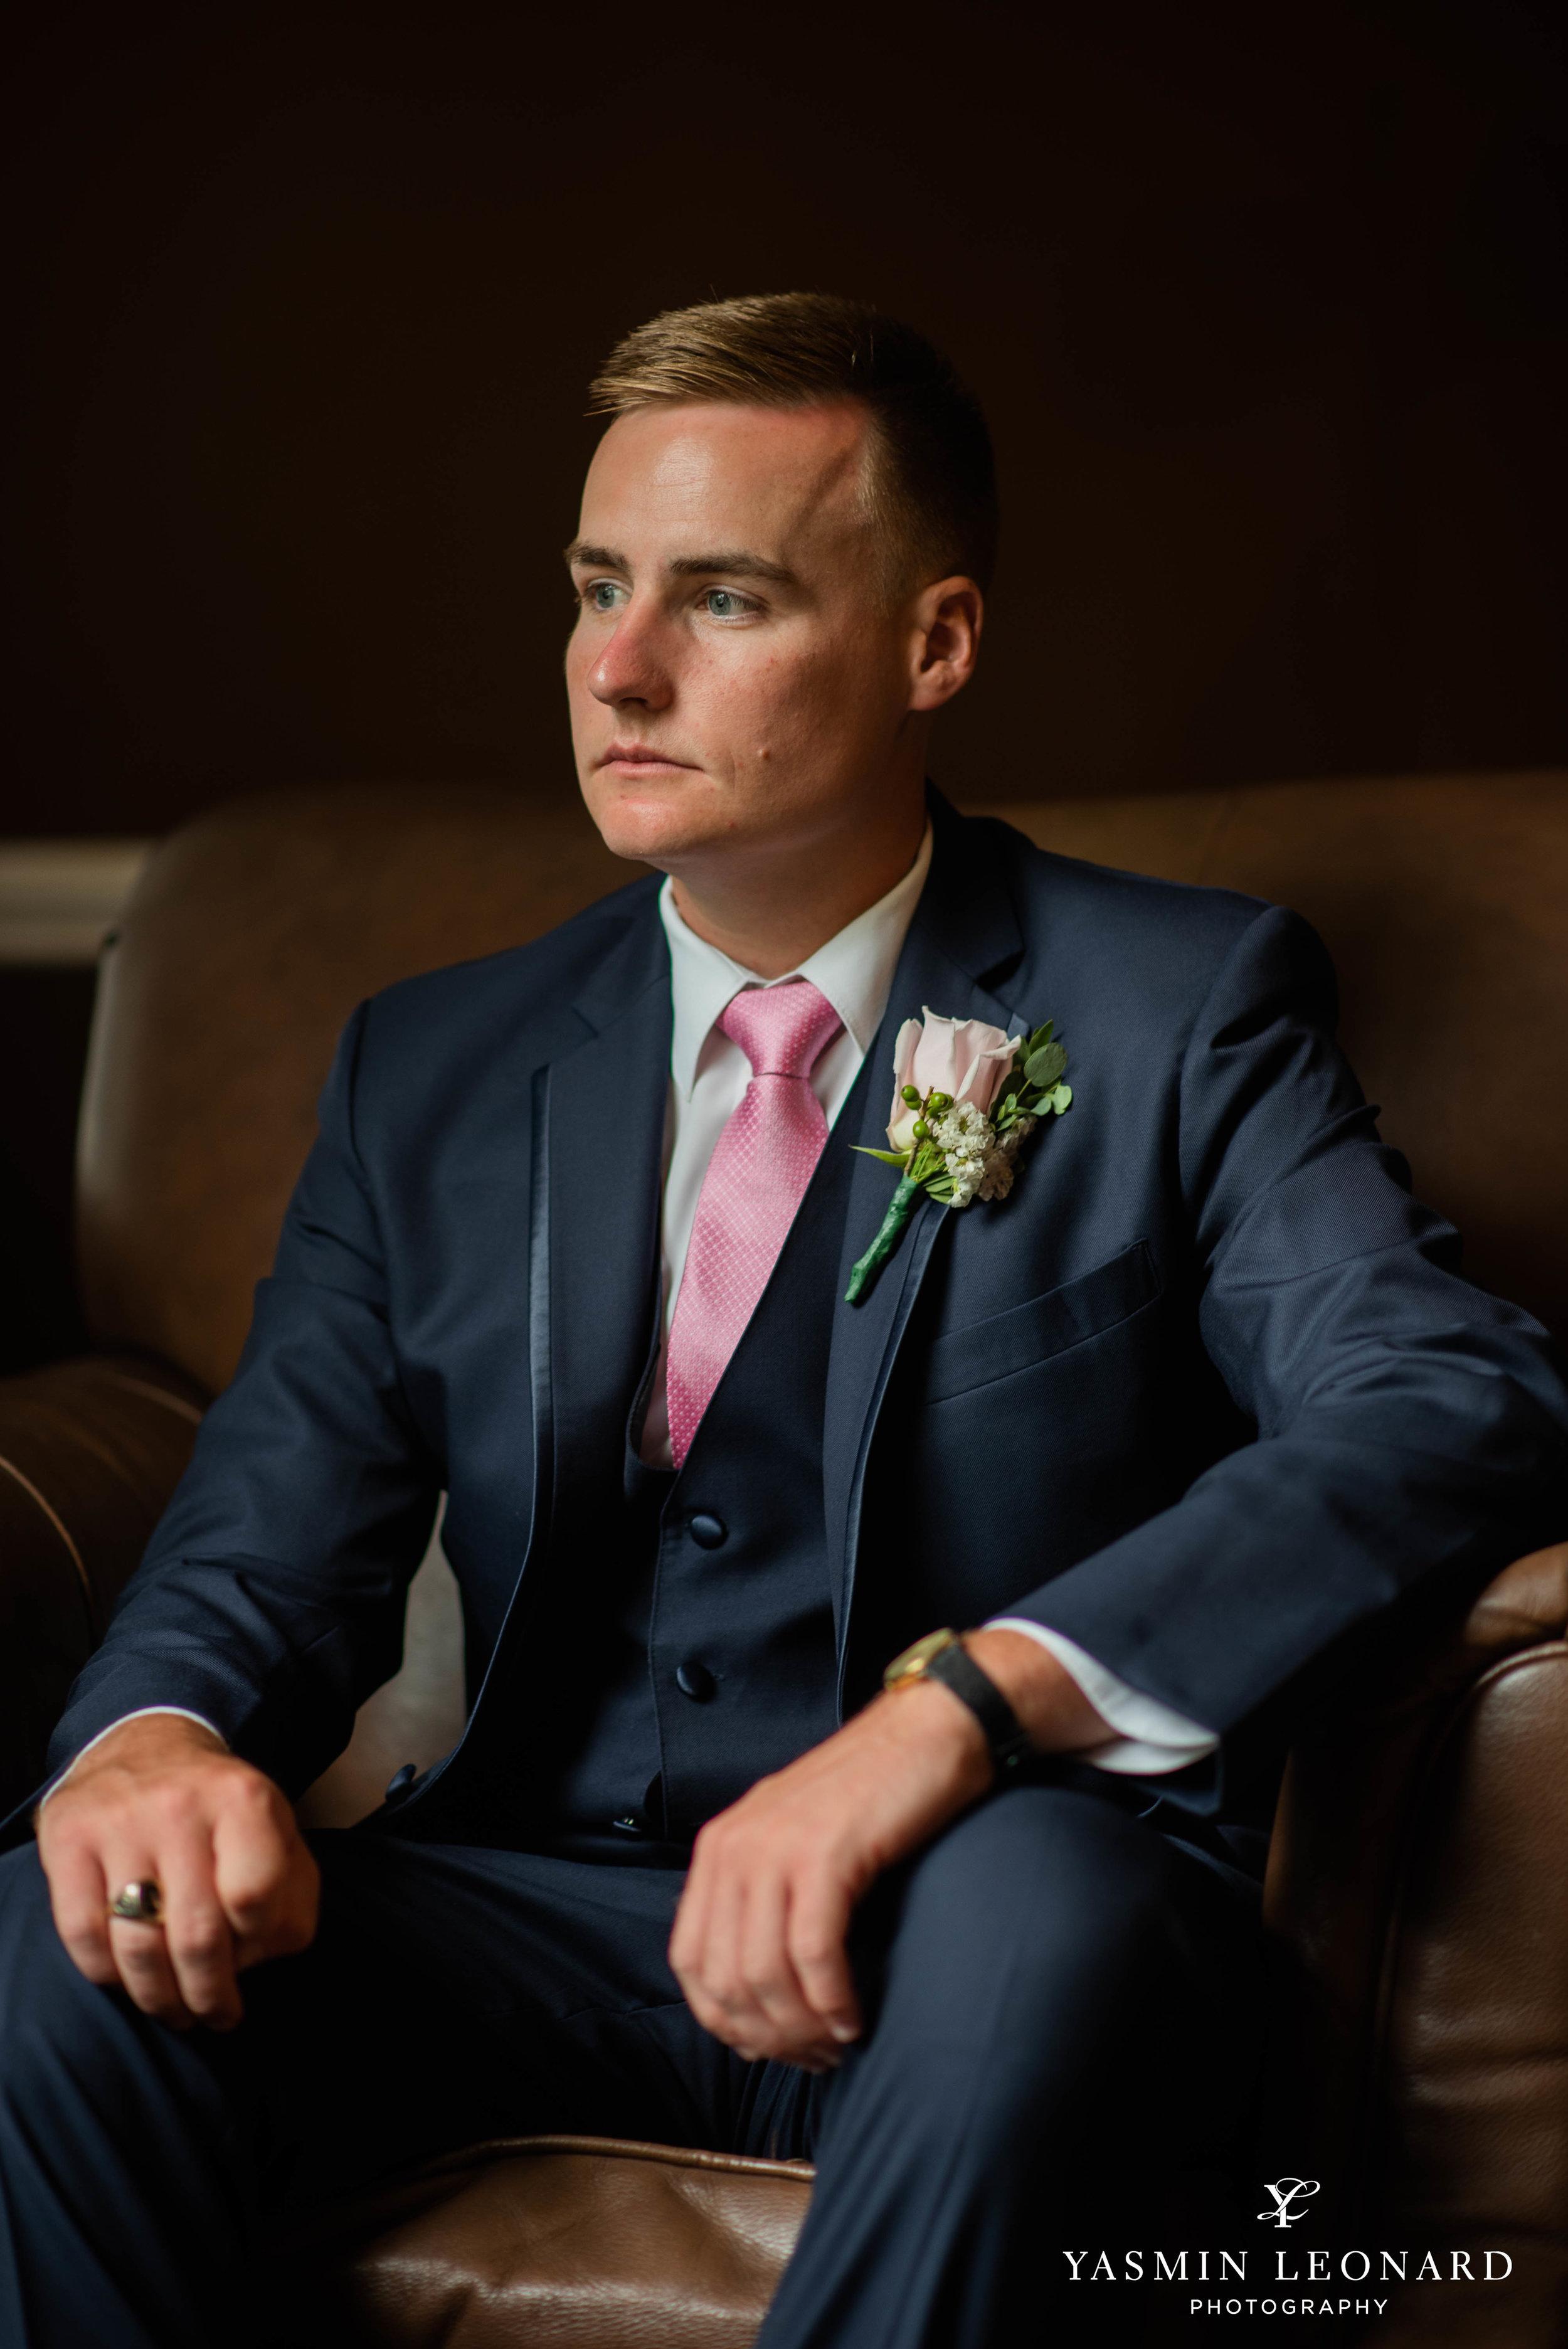 Separk Mansion - NC Weddings - Gastonia Wedding - NC Wedding Venues - Pink and Blue Wedding Ideas - Pink Bridesmaid Dresses - Yasmin Leonard Photography-11.jpg